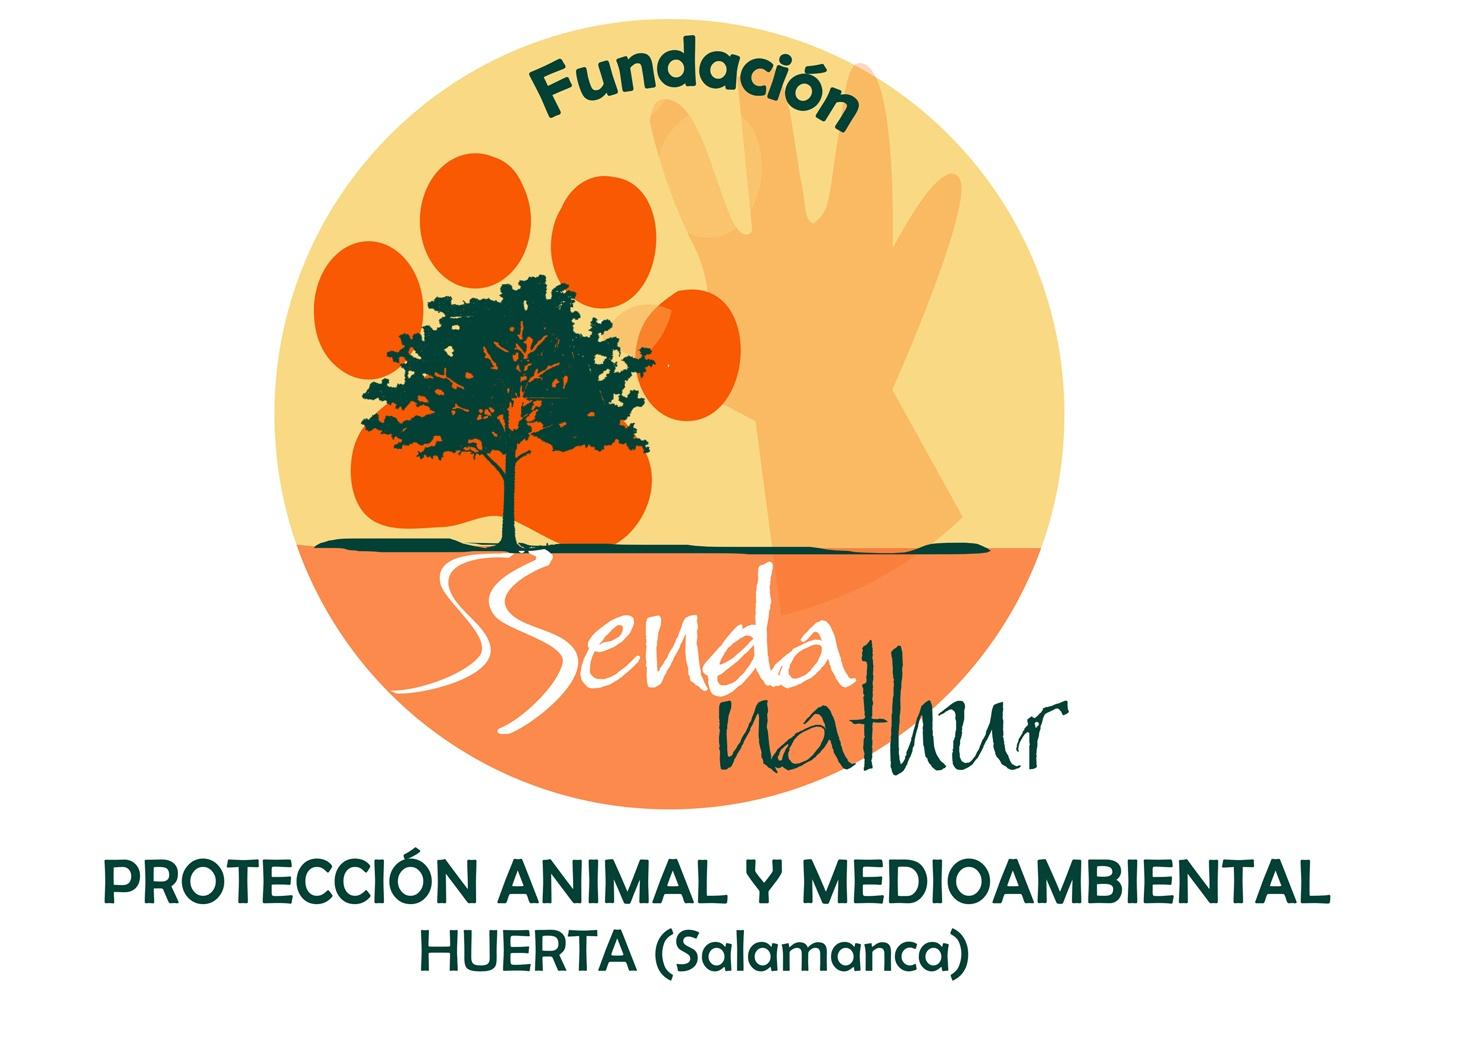 Fundacion Senda Nathur